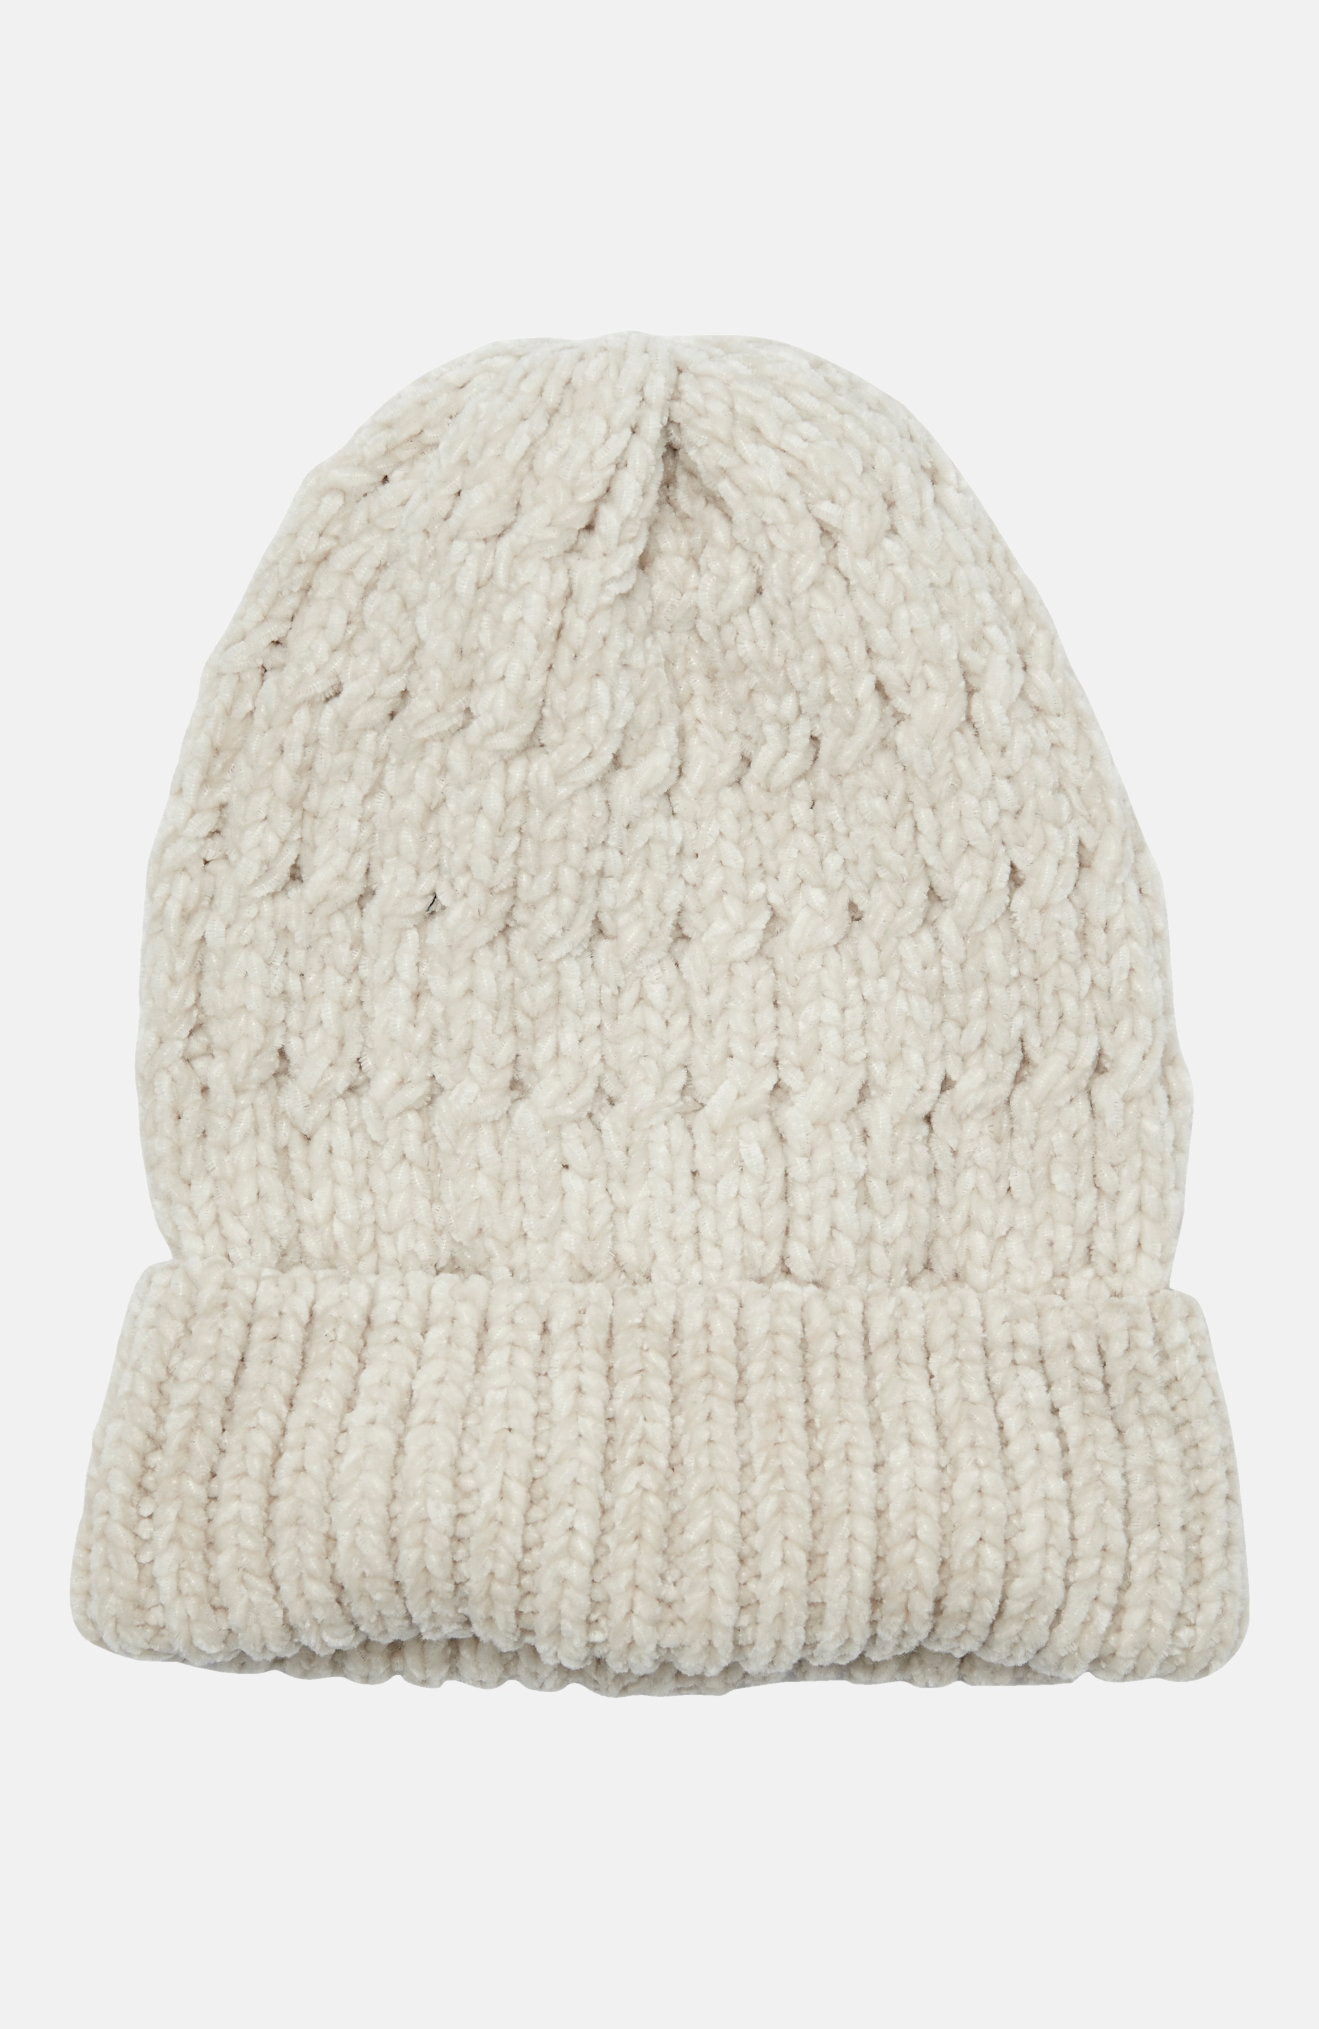 Šenill-lõngast kootud müts